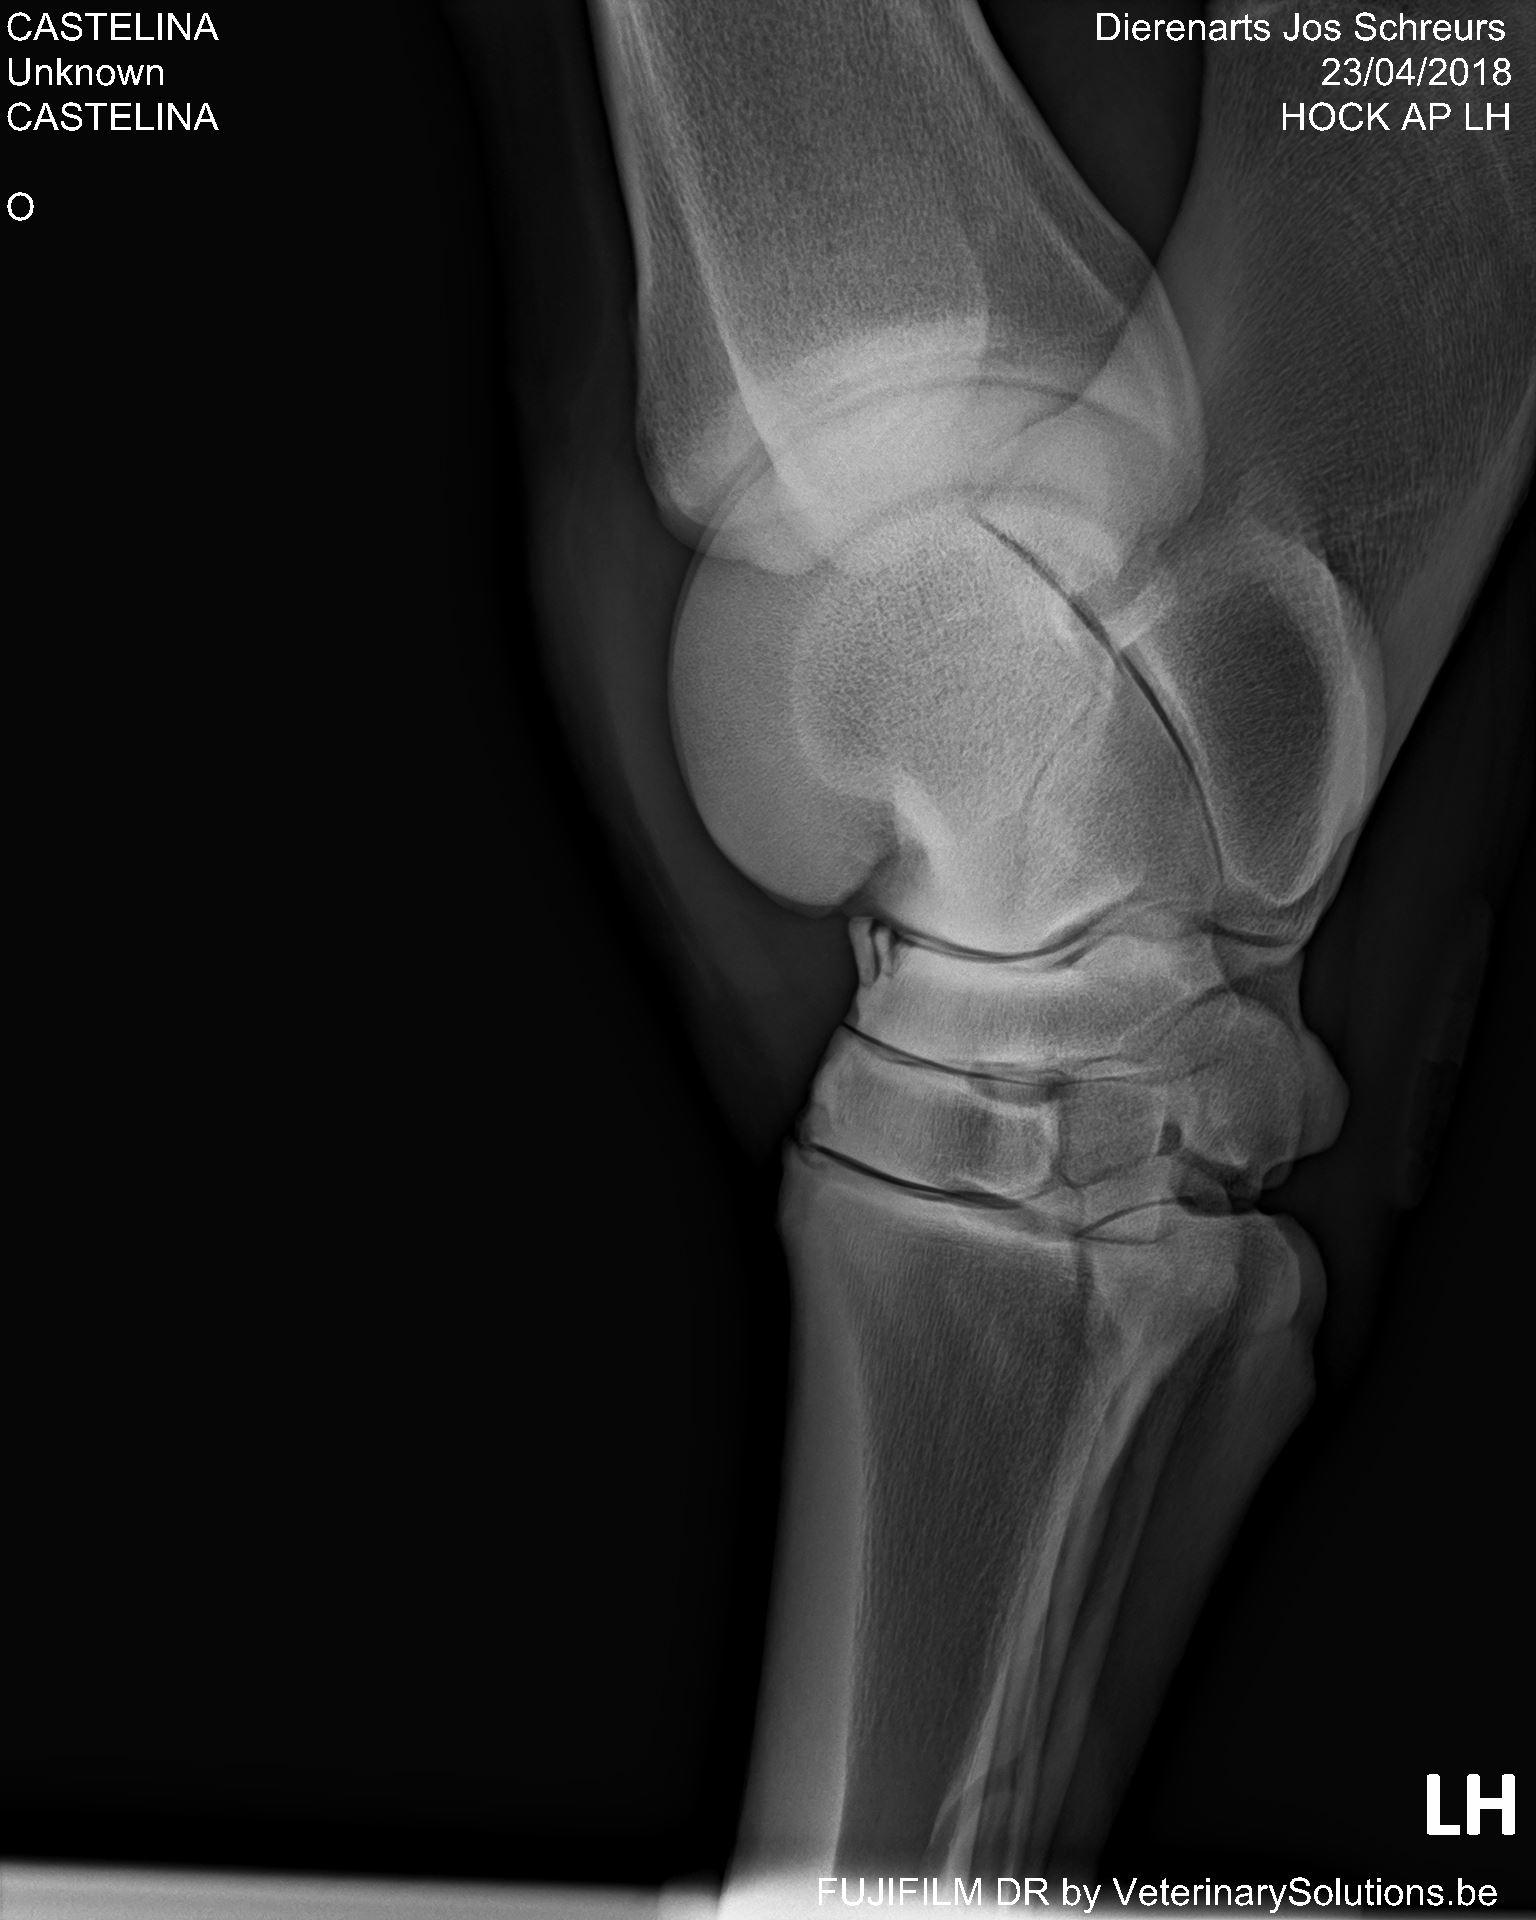 Fracture d'avulsion avant os tarsi central dans l'articulation du jarret du cheval